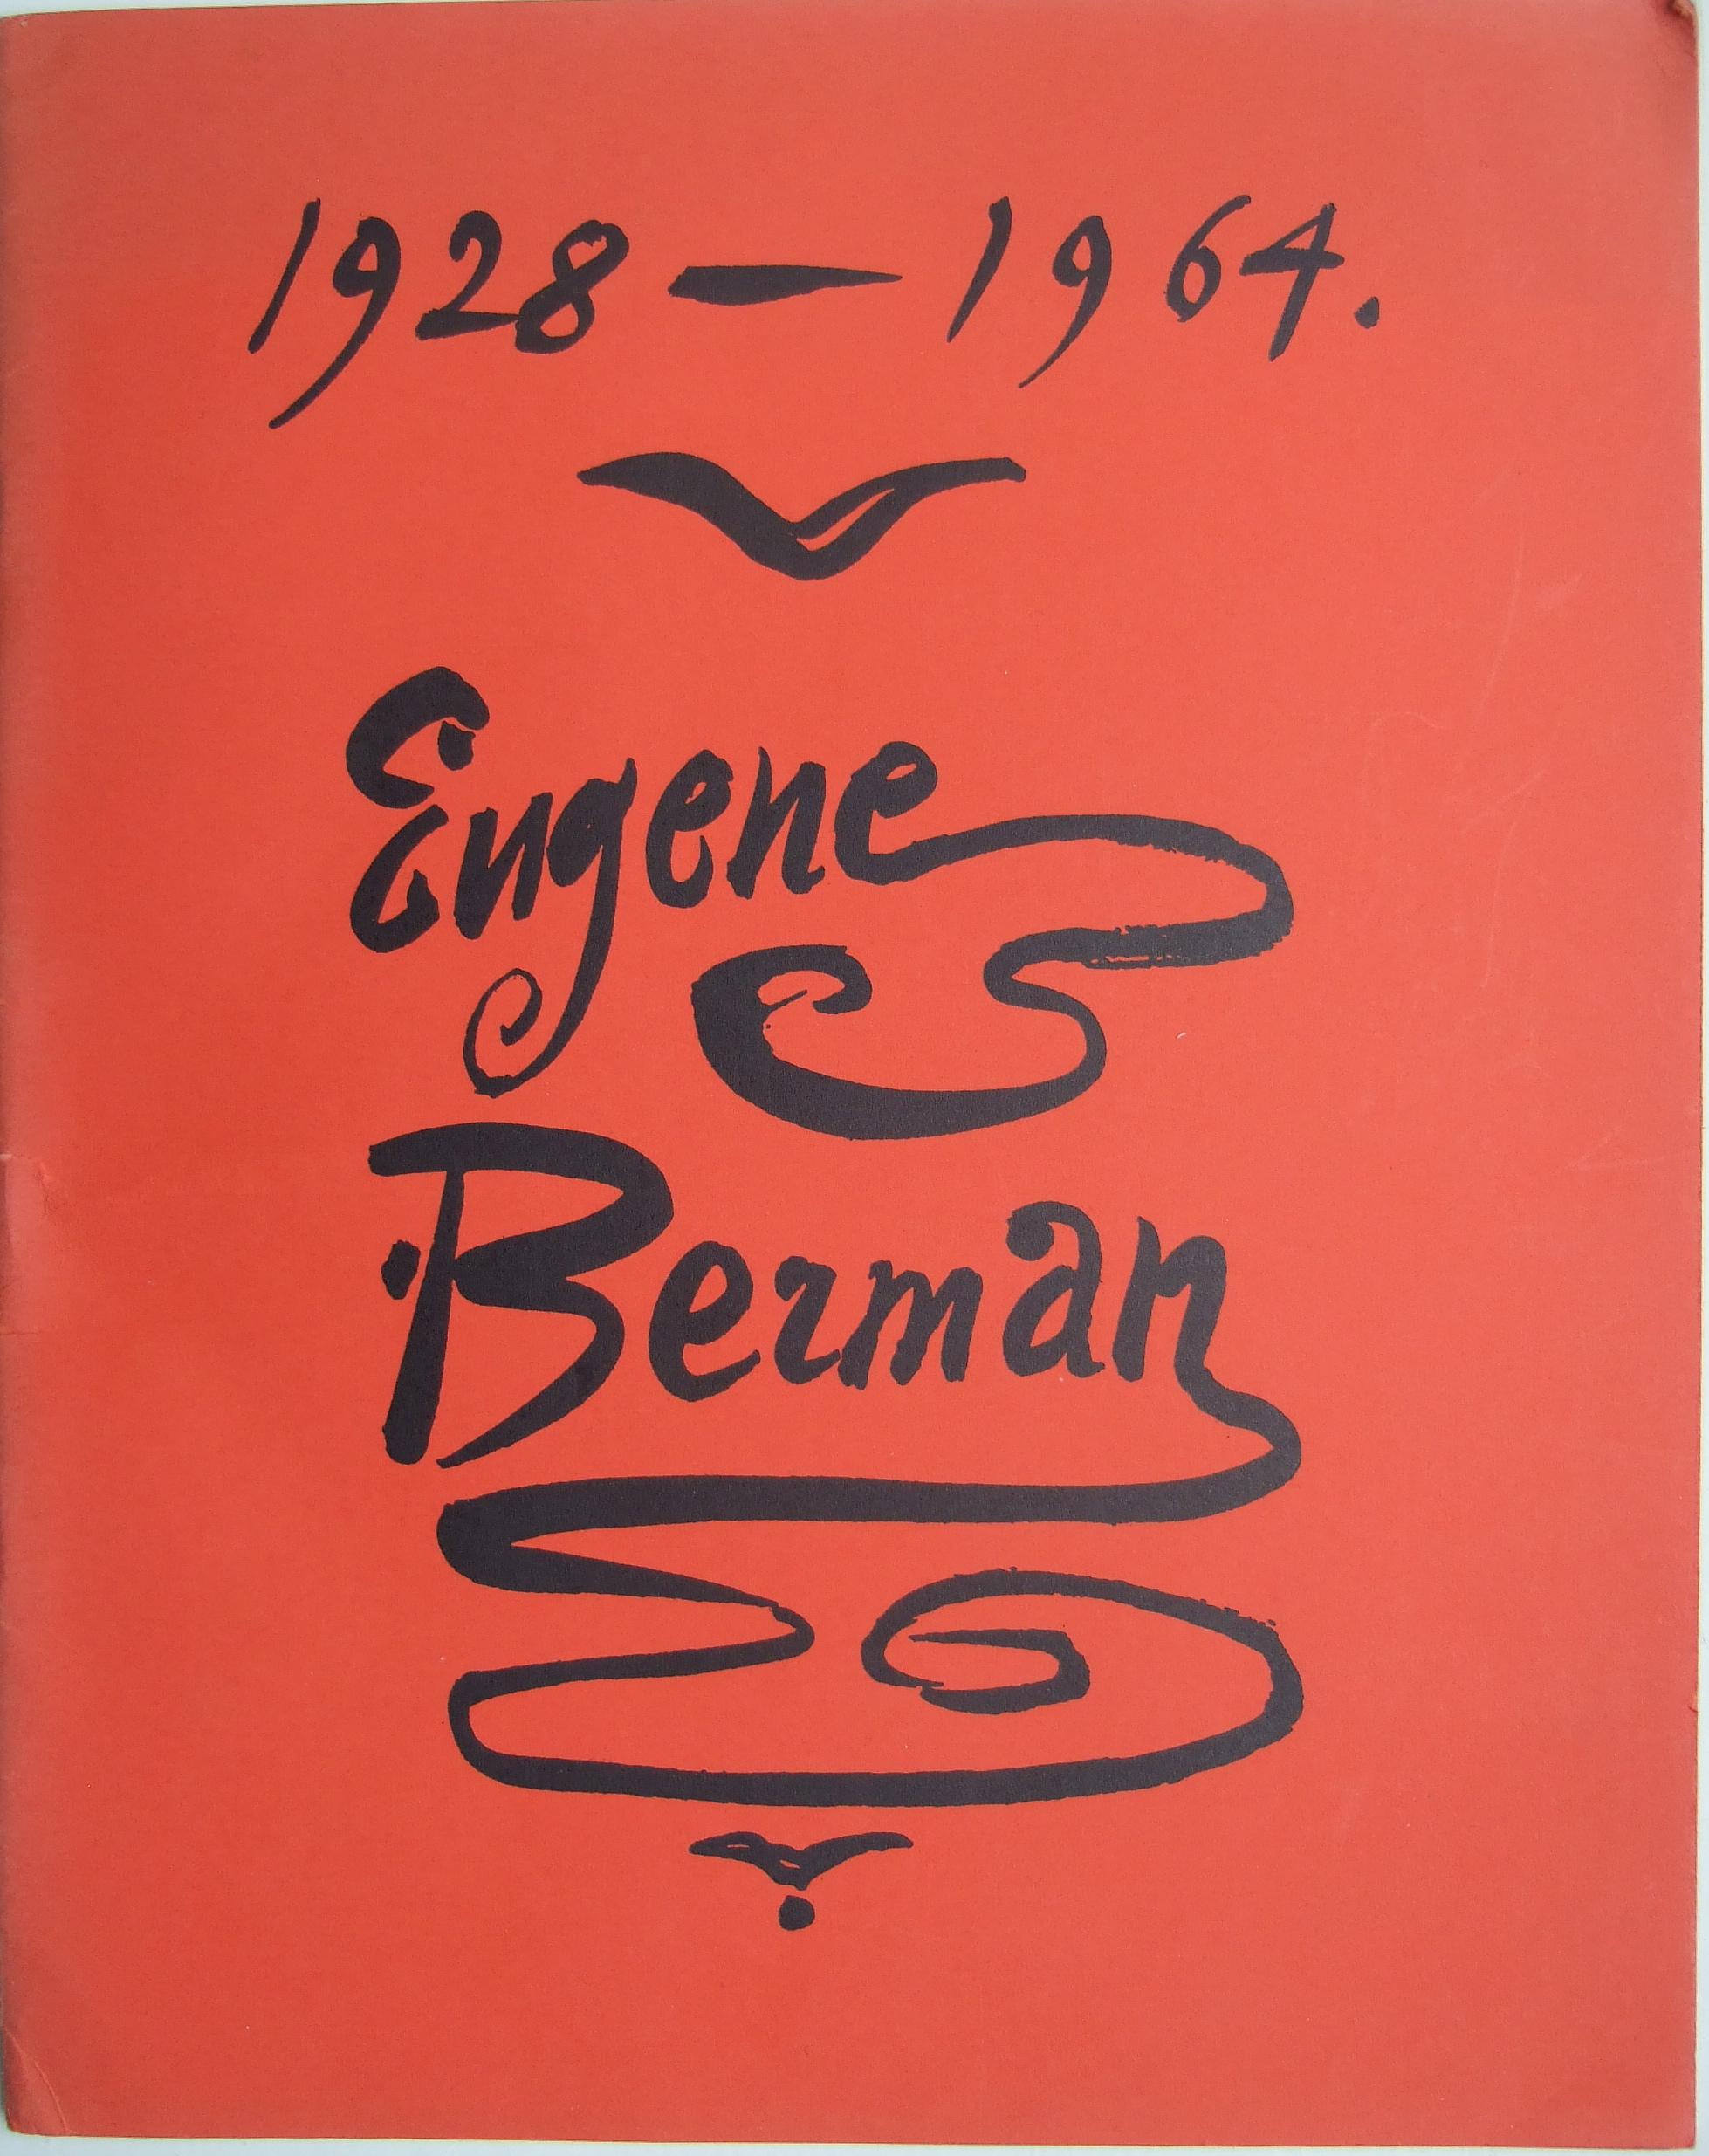 Eugene BERMAN. Exhibition Catalogue. November 1964.